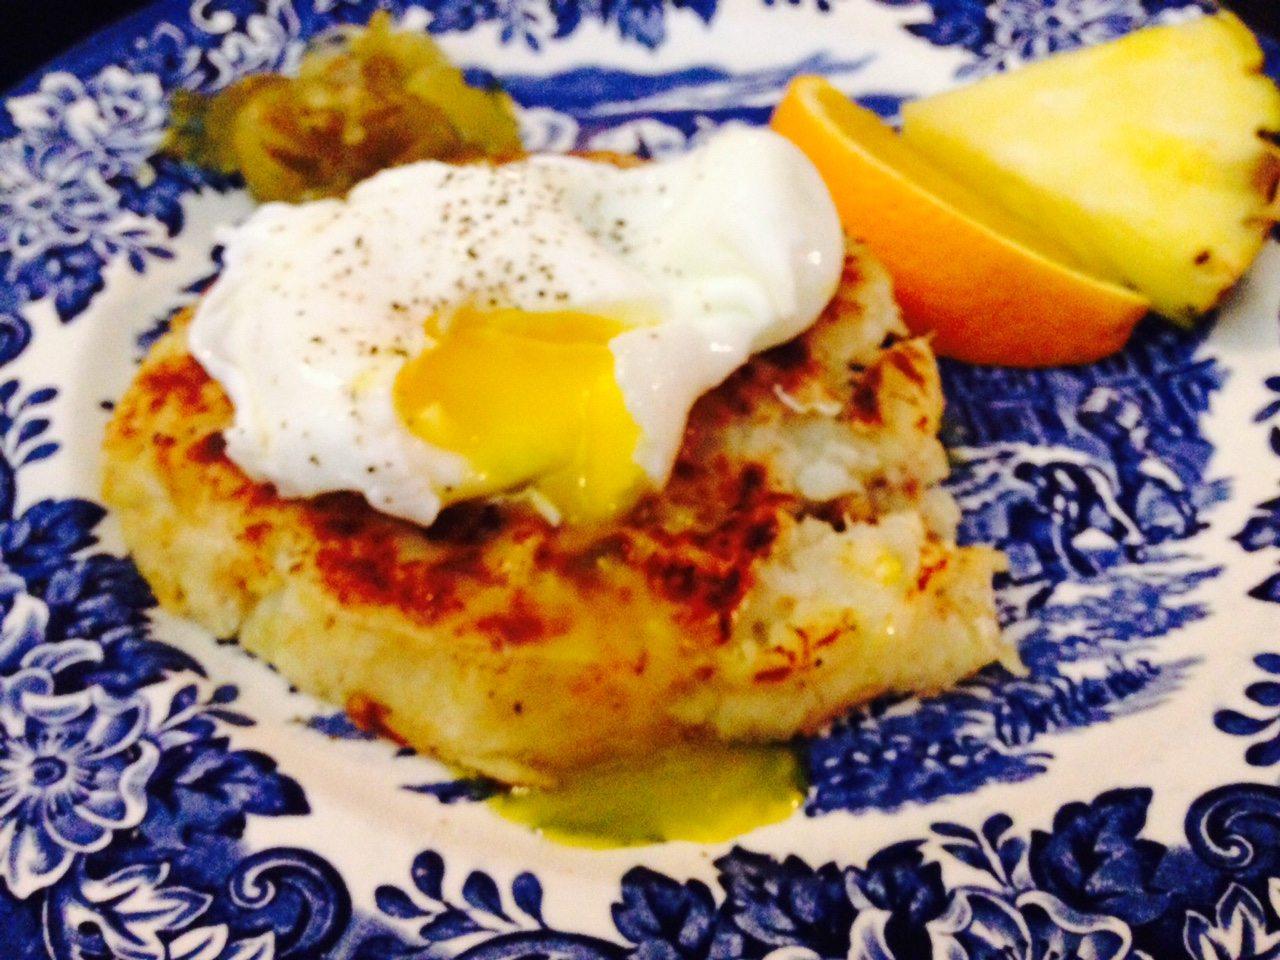 toronto-chefs-restaurants-consumed-bob-blumer-food-network-surreal-gourmet-cod-cake